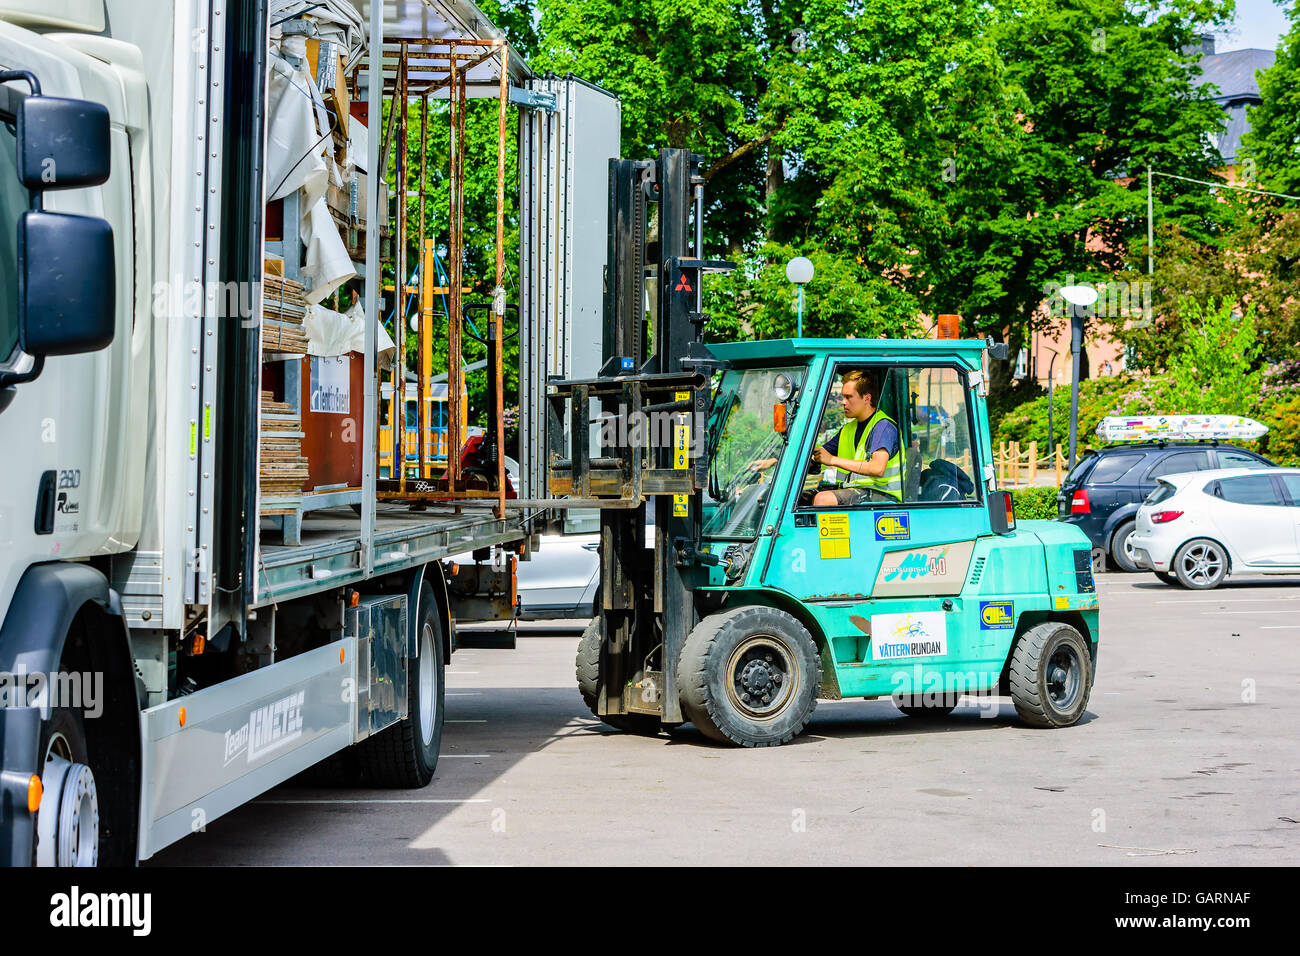 Motala Sweden - June 21 2016: Worker load or unload a steel cage Stock Photo: 109930423 - Alamy